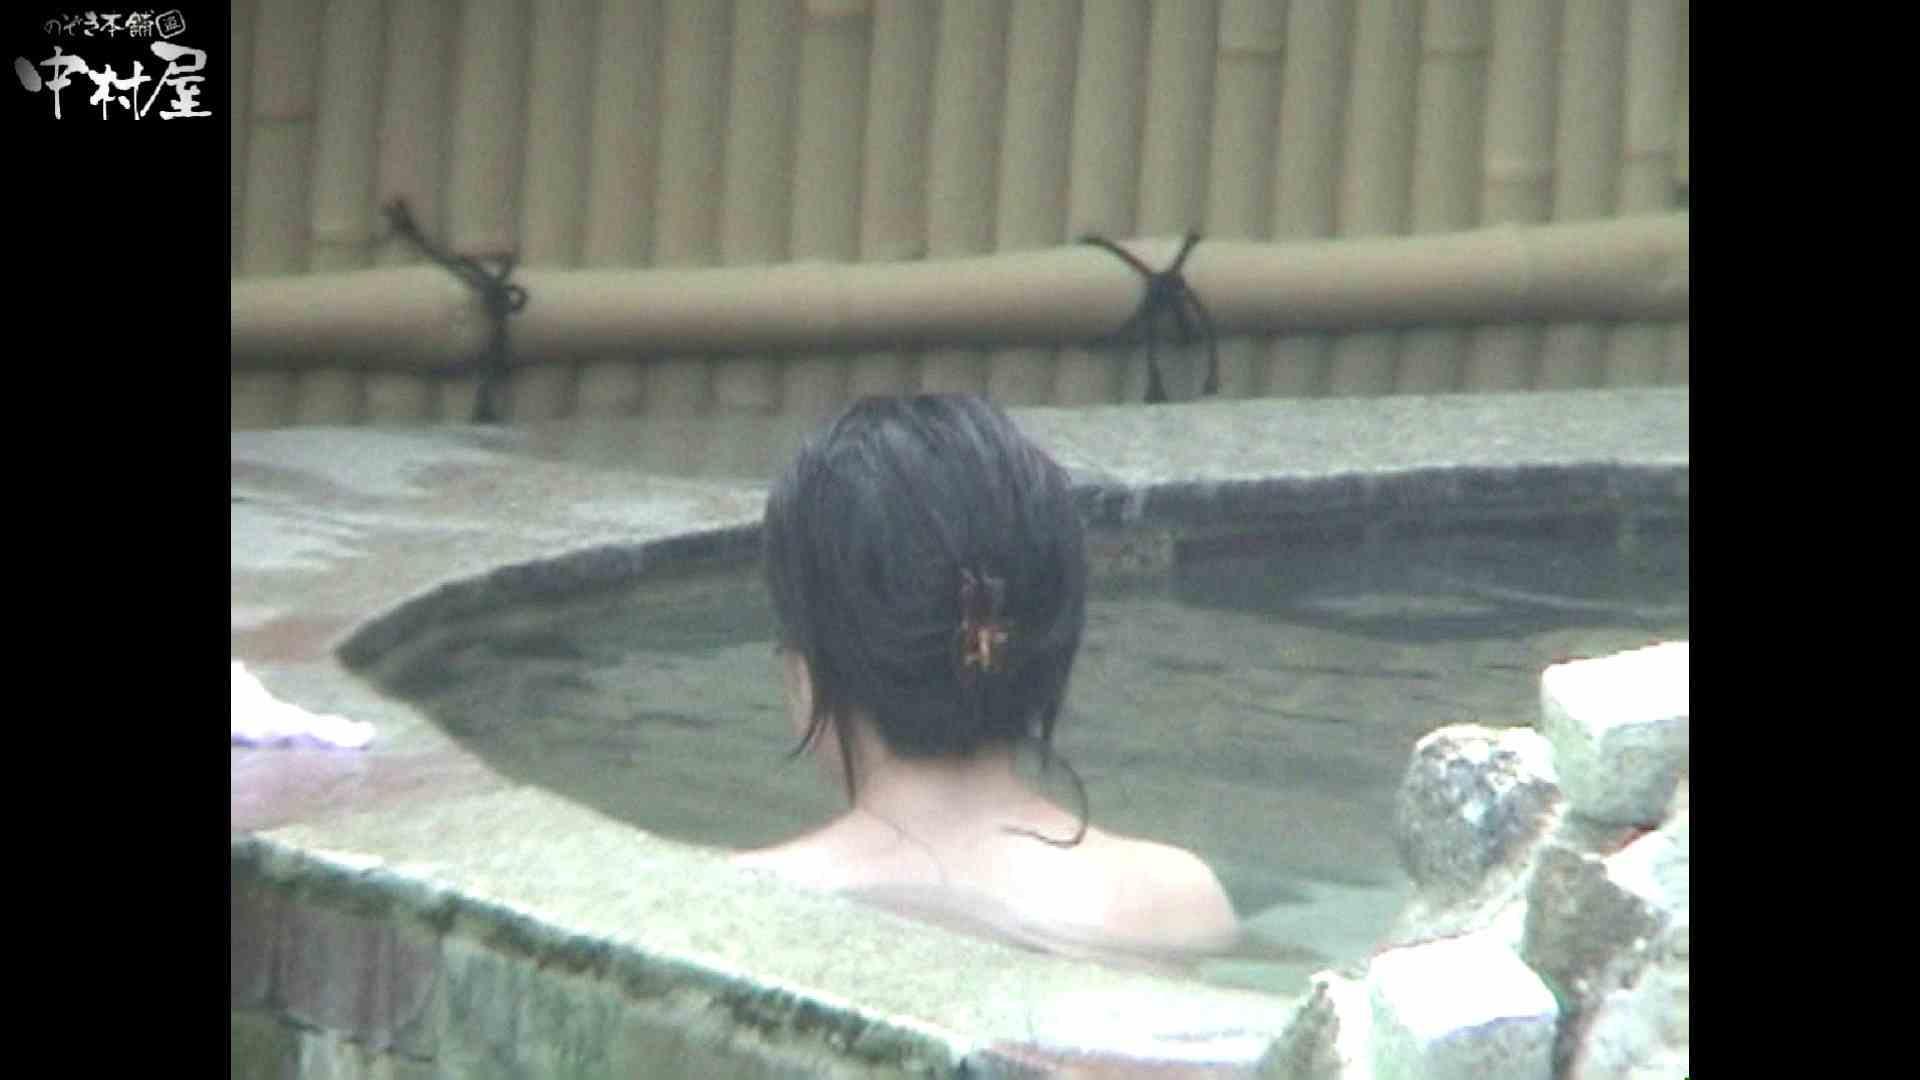 Aquaな露天風呂Vol.936 盗撮映像  110Pix 13